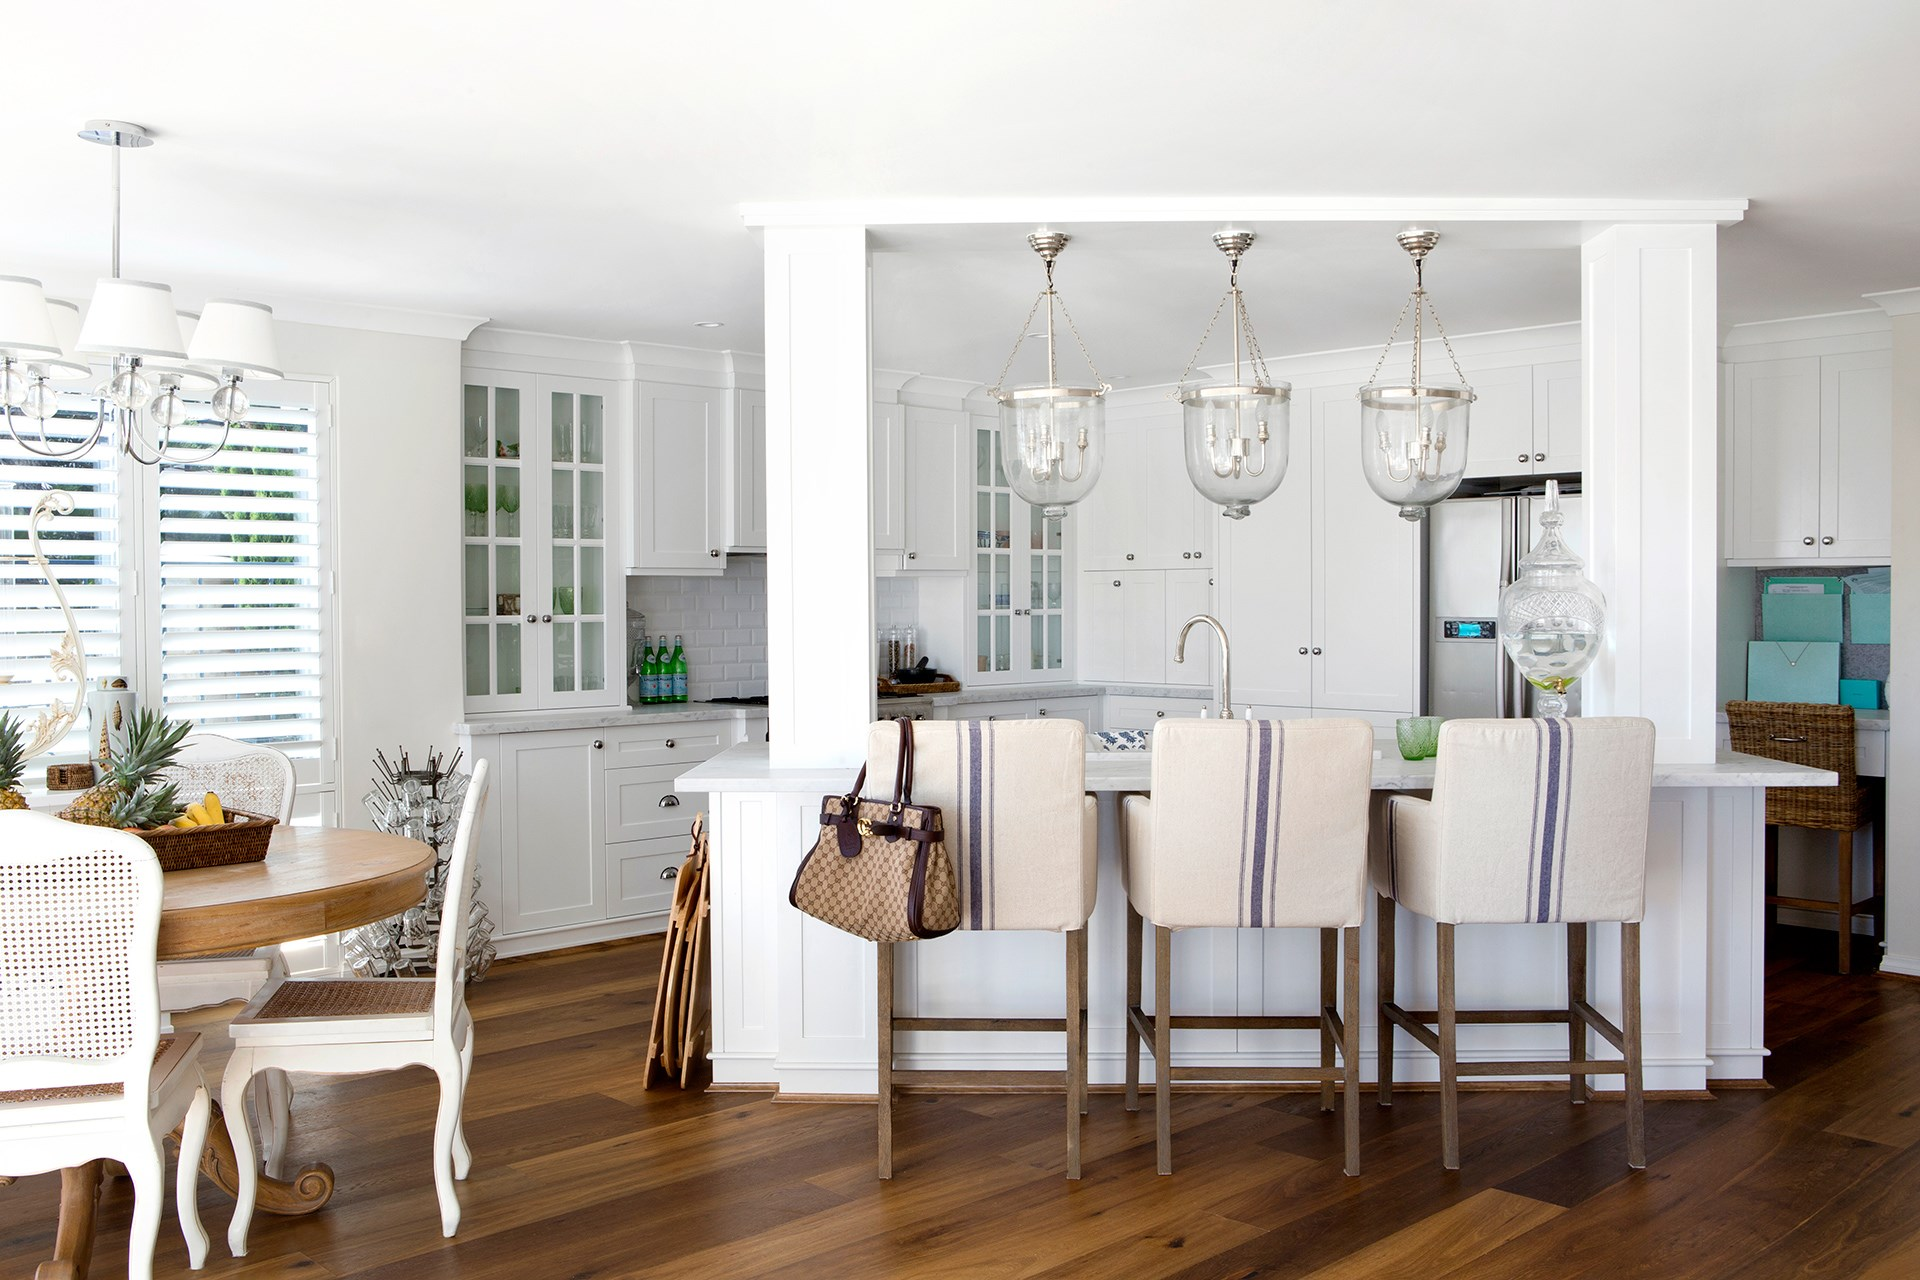 Coastal Kitchen Design Interior 23 beautiful beach style kitchens pictures designing idea coastal